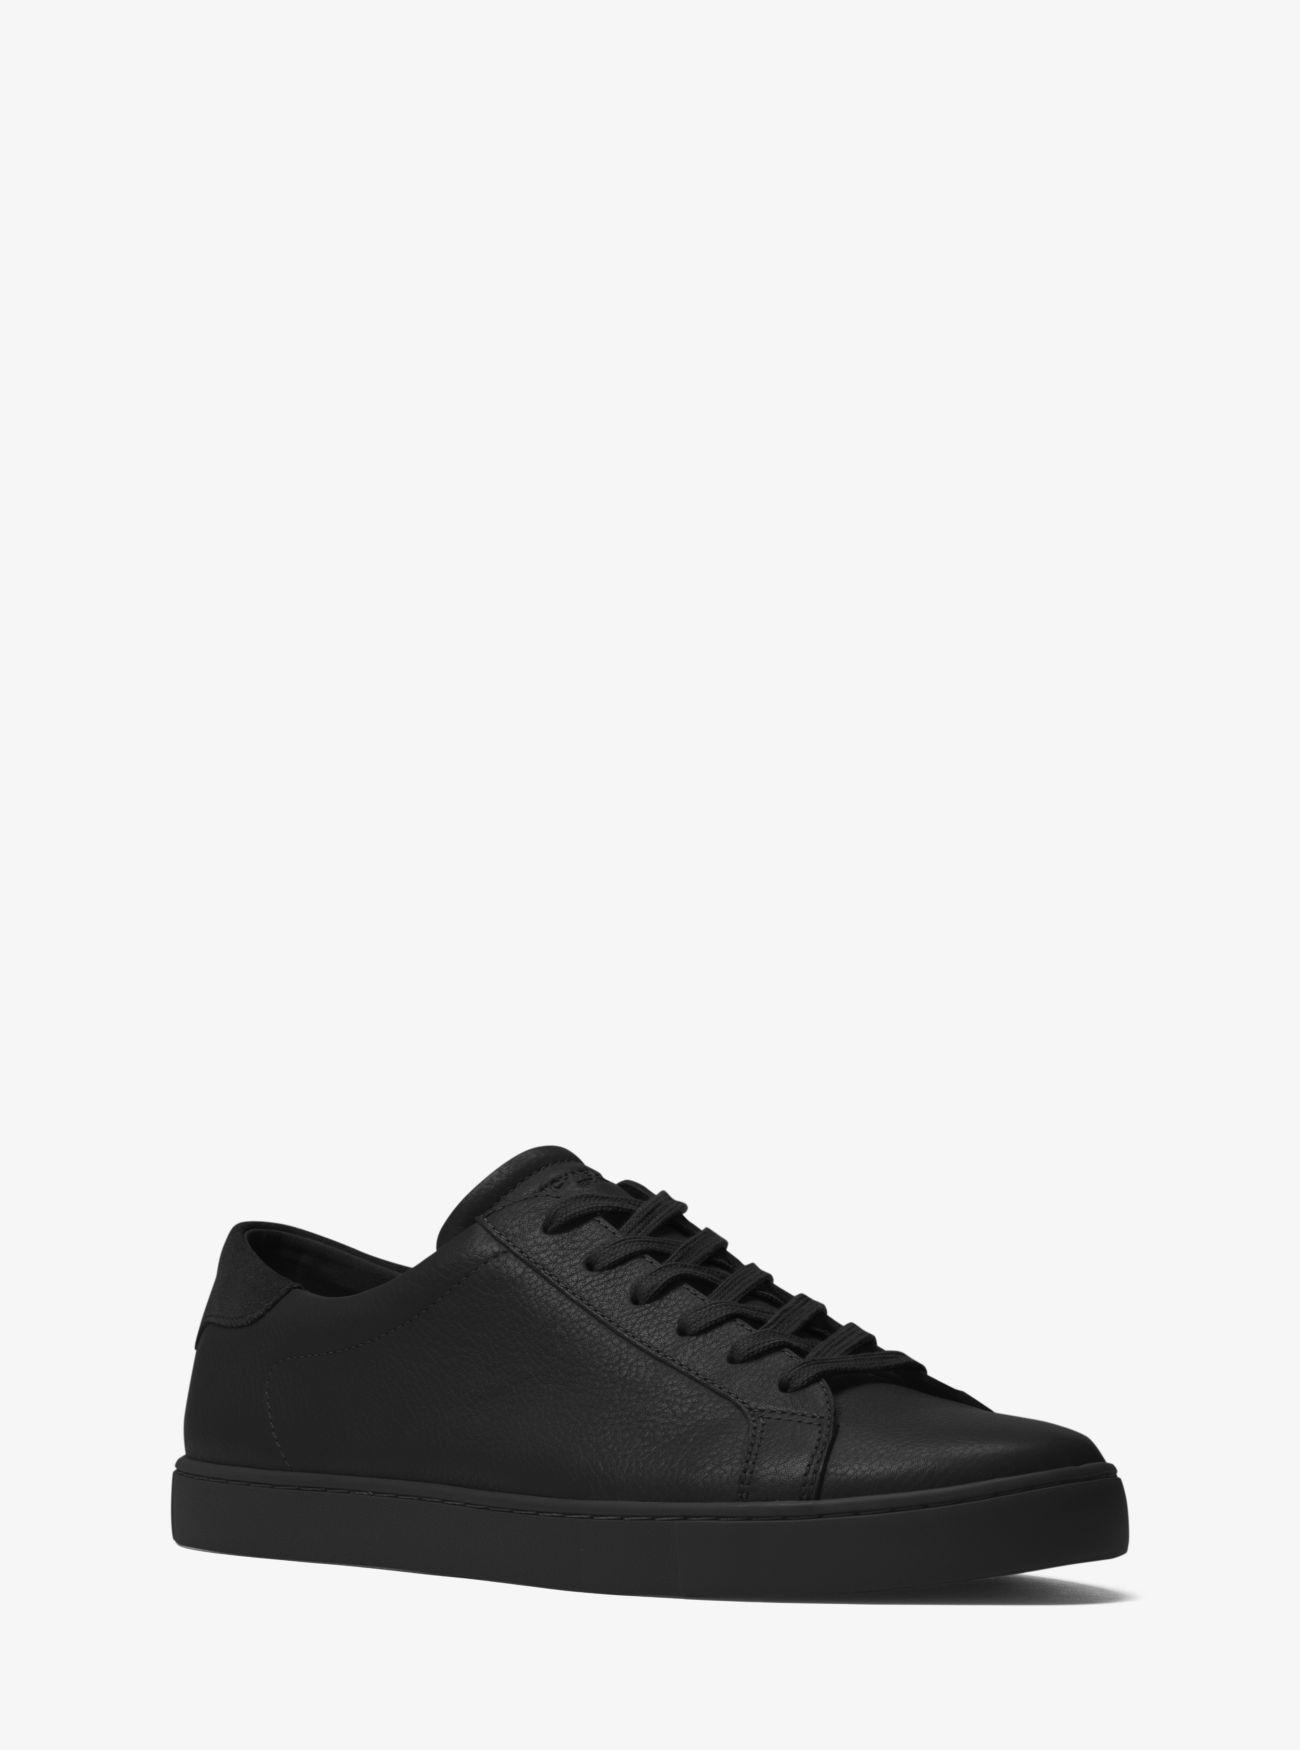 71ca53cac524 MICHAEL KORS Jake Leather Sneaker.  michaelkors  shoes